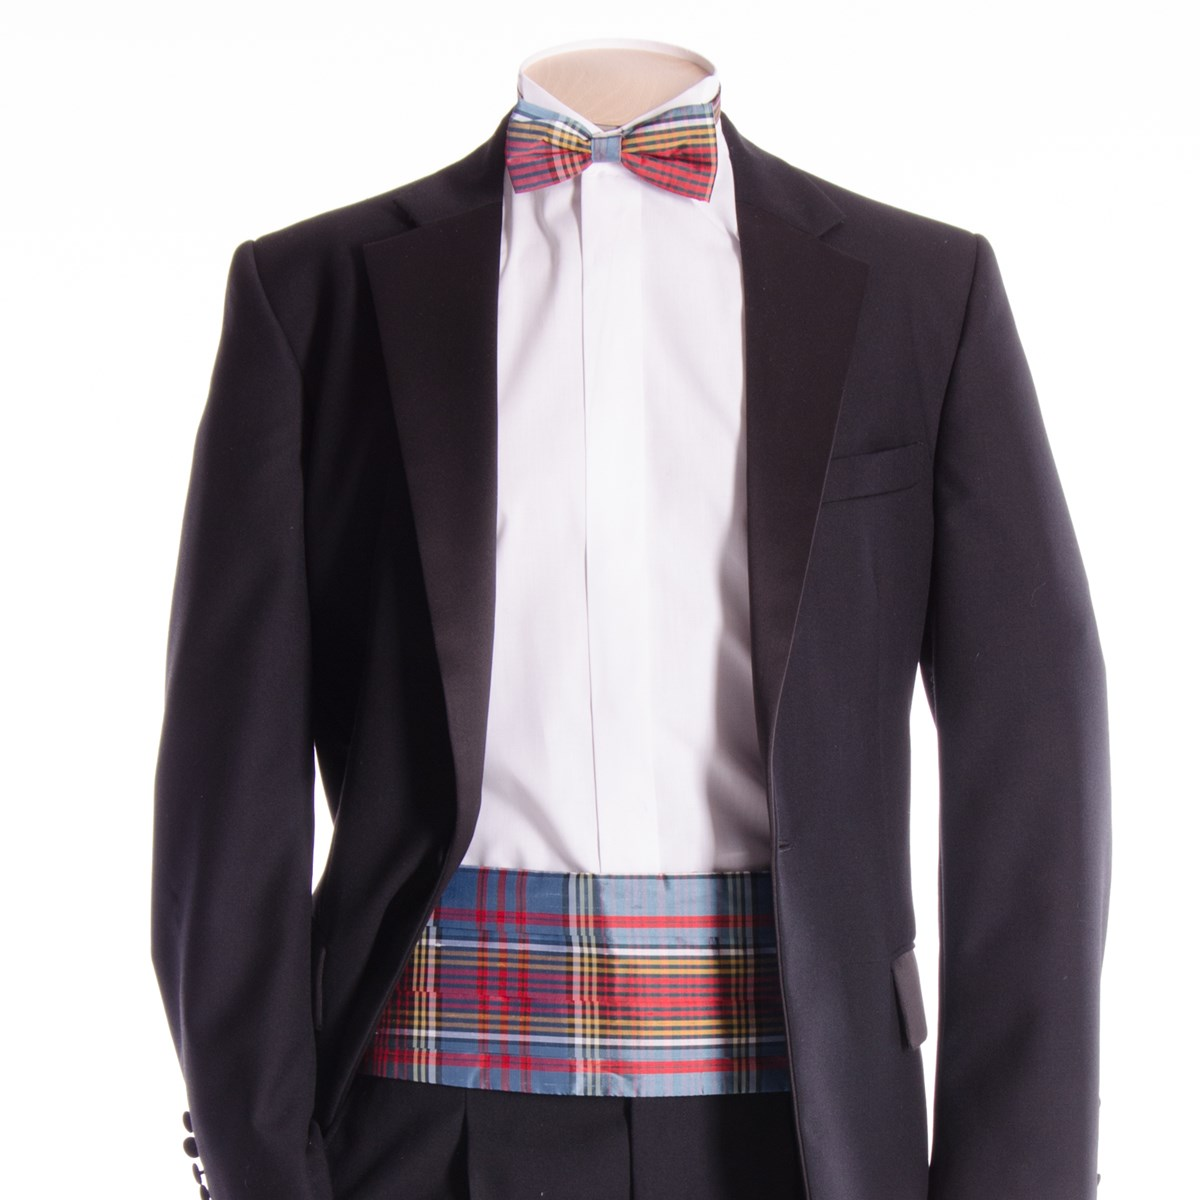 a057aecf1fc Tartan Cummerbund and Bow Tie in Modern Anderson Silk Material - The Kilt  Store